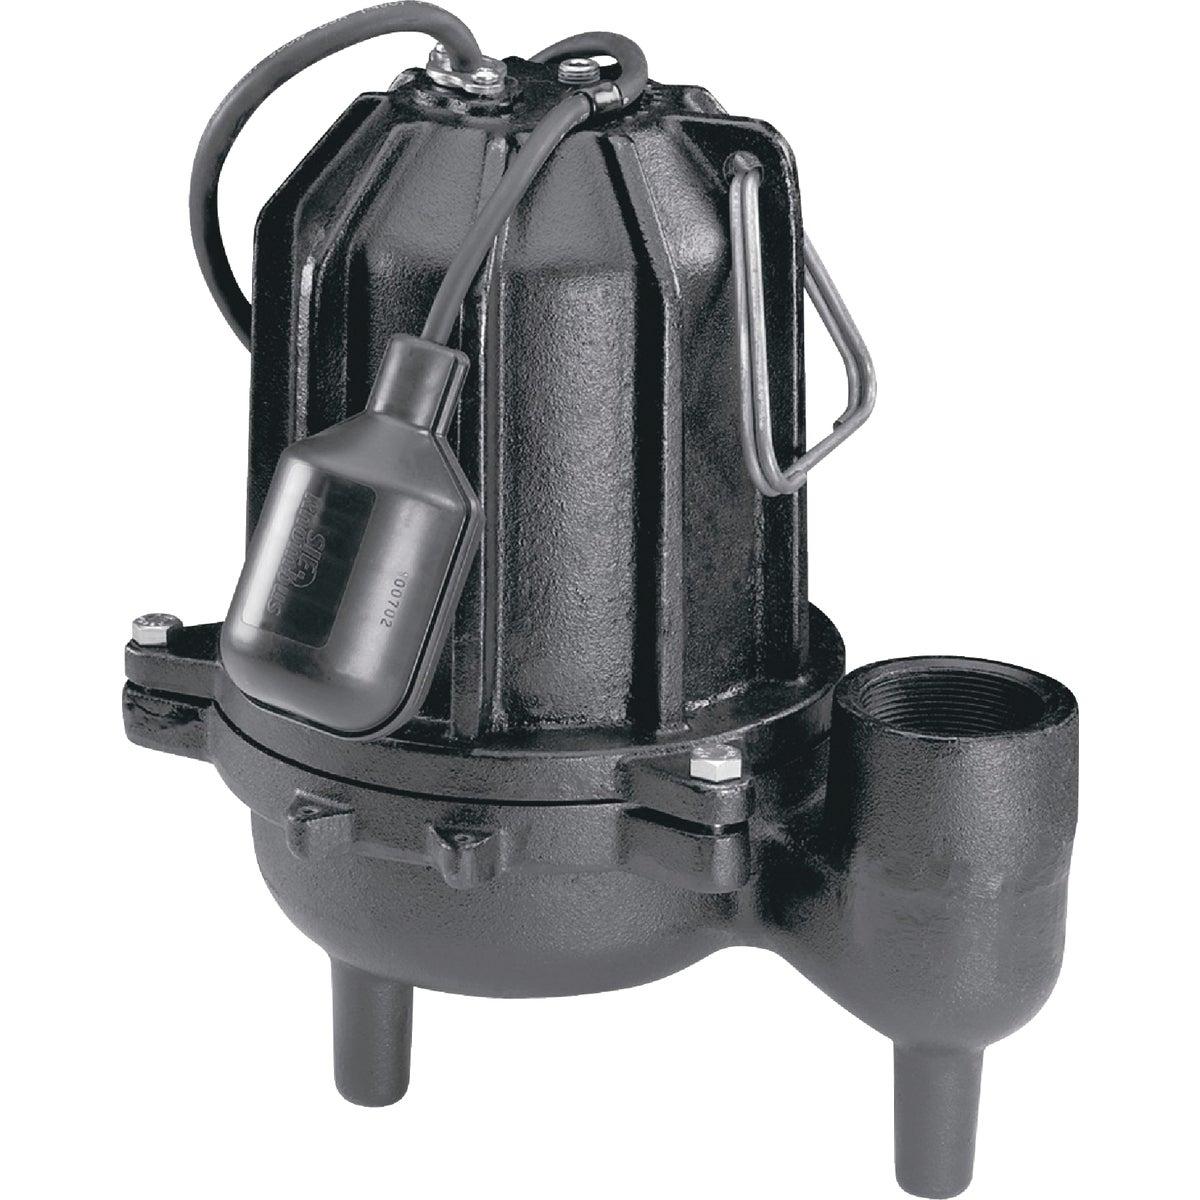 Wayne Home Equipment 1/2HP CAST SEWAGE PUMP CSE50T